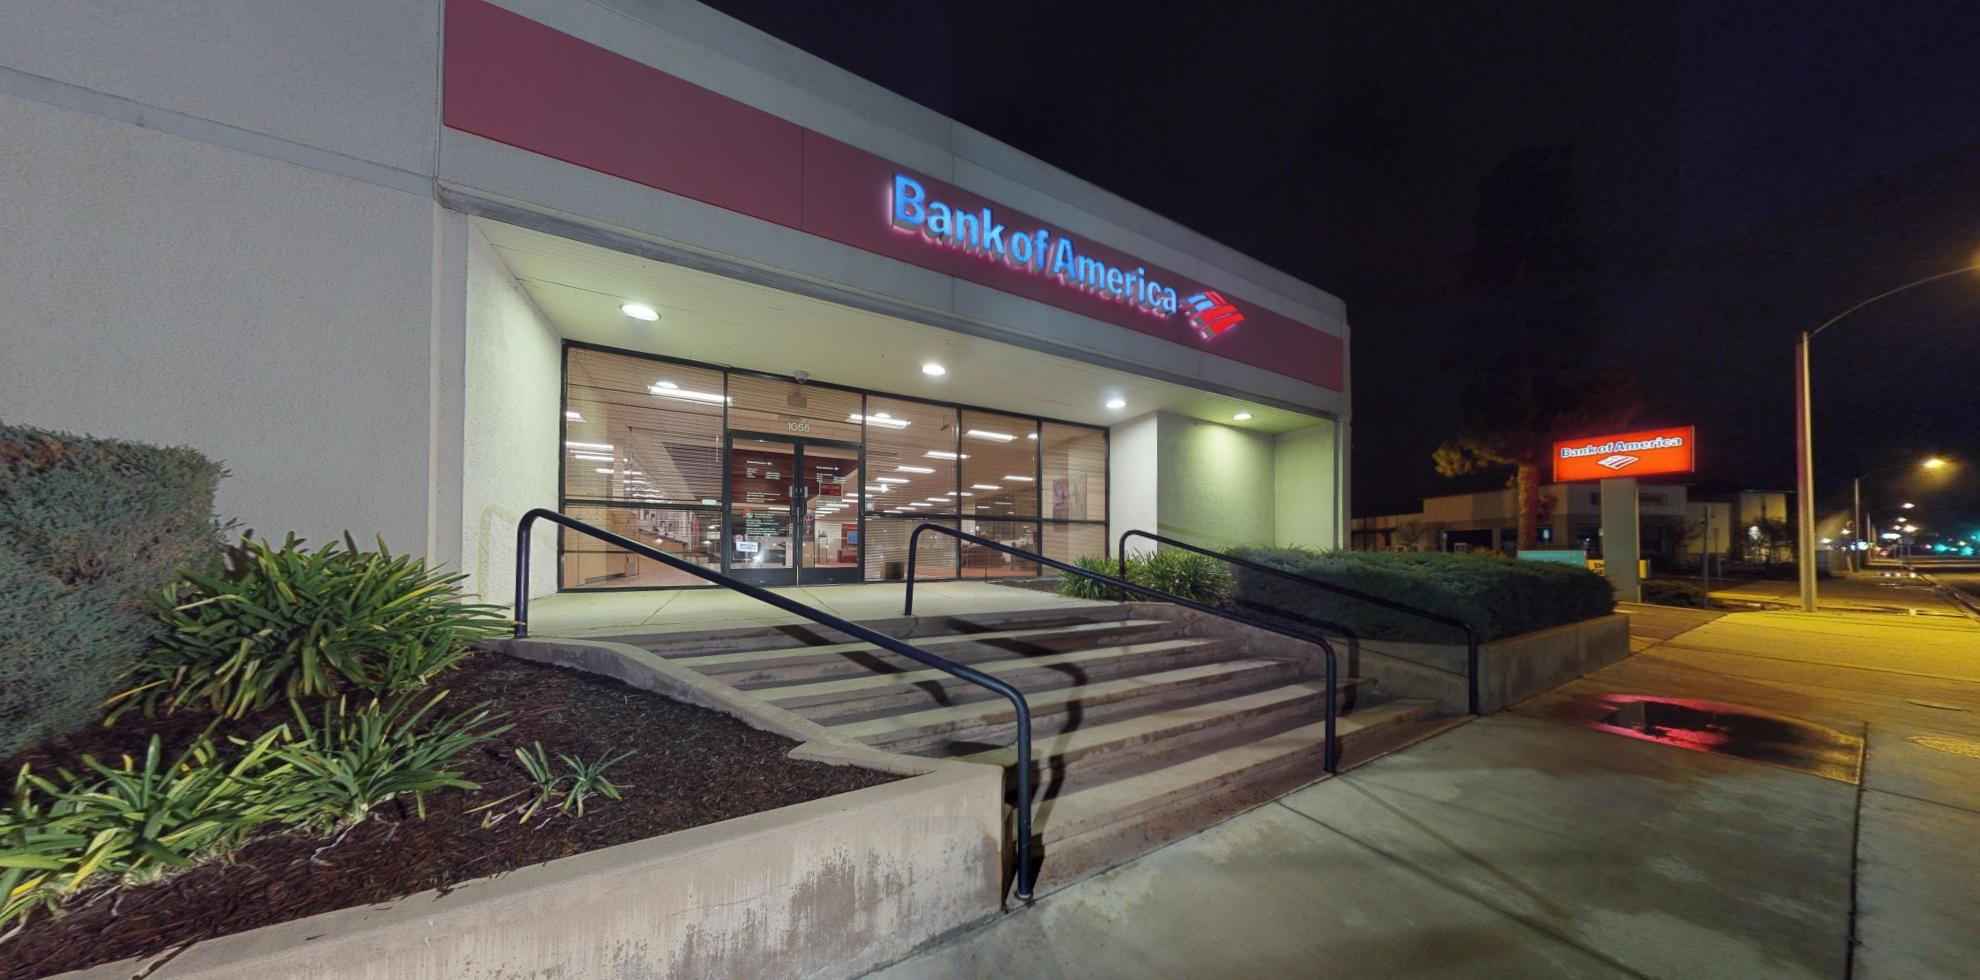 Bank of America financial center with drive-thru ATM | 1055 Calimesa Blvd, Calimesa, CA 92320